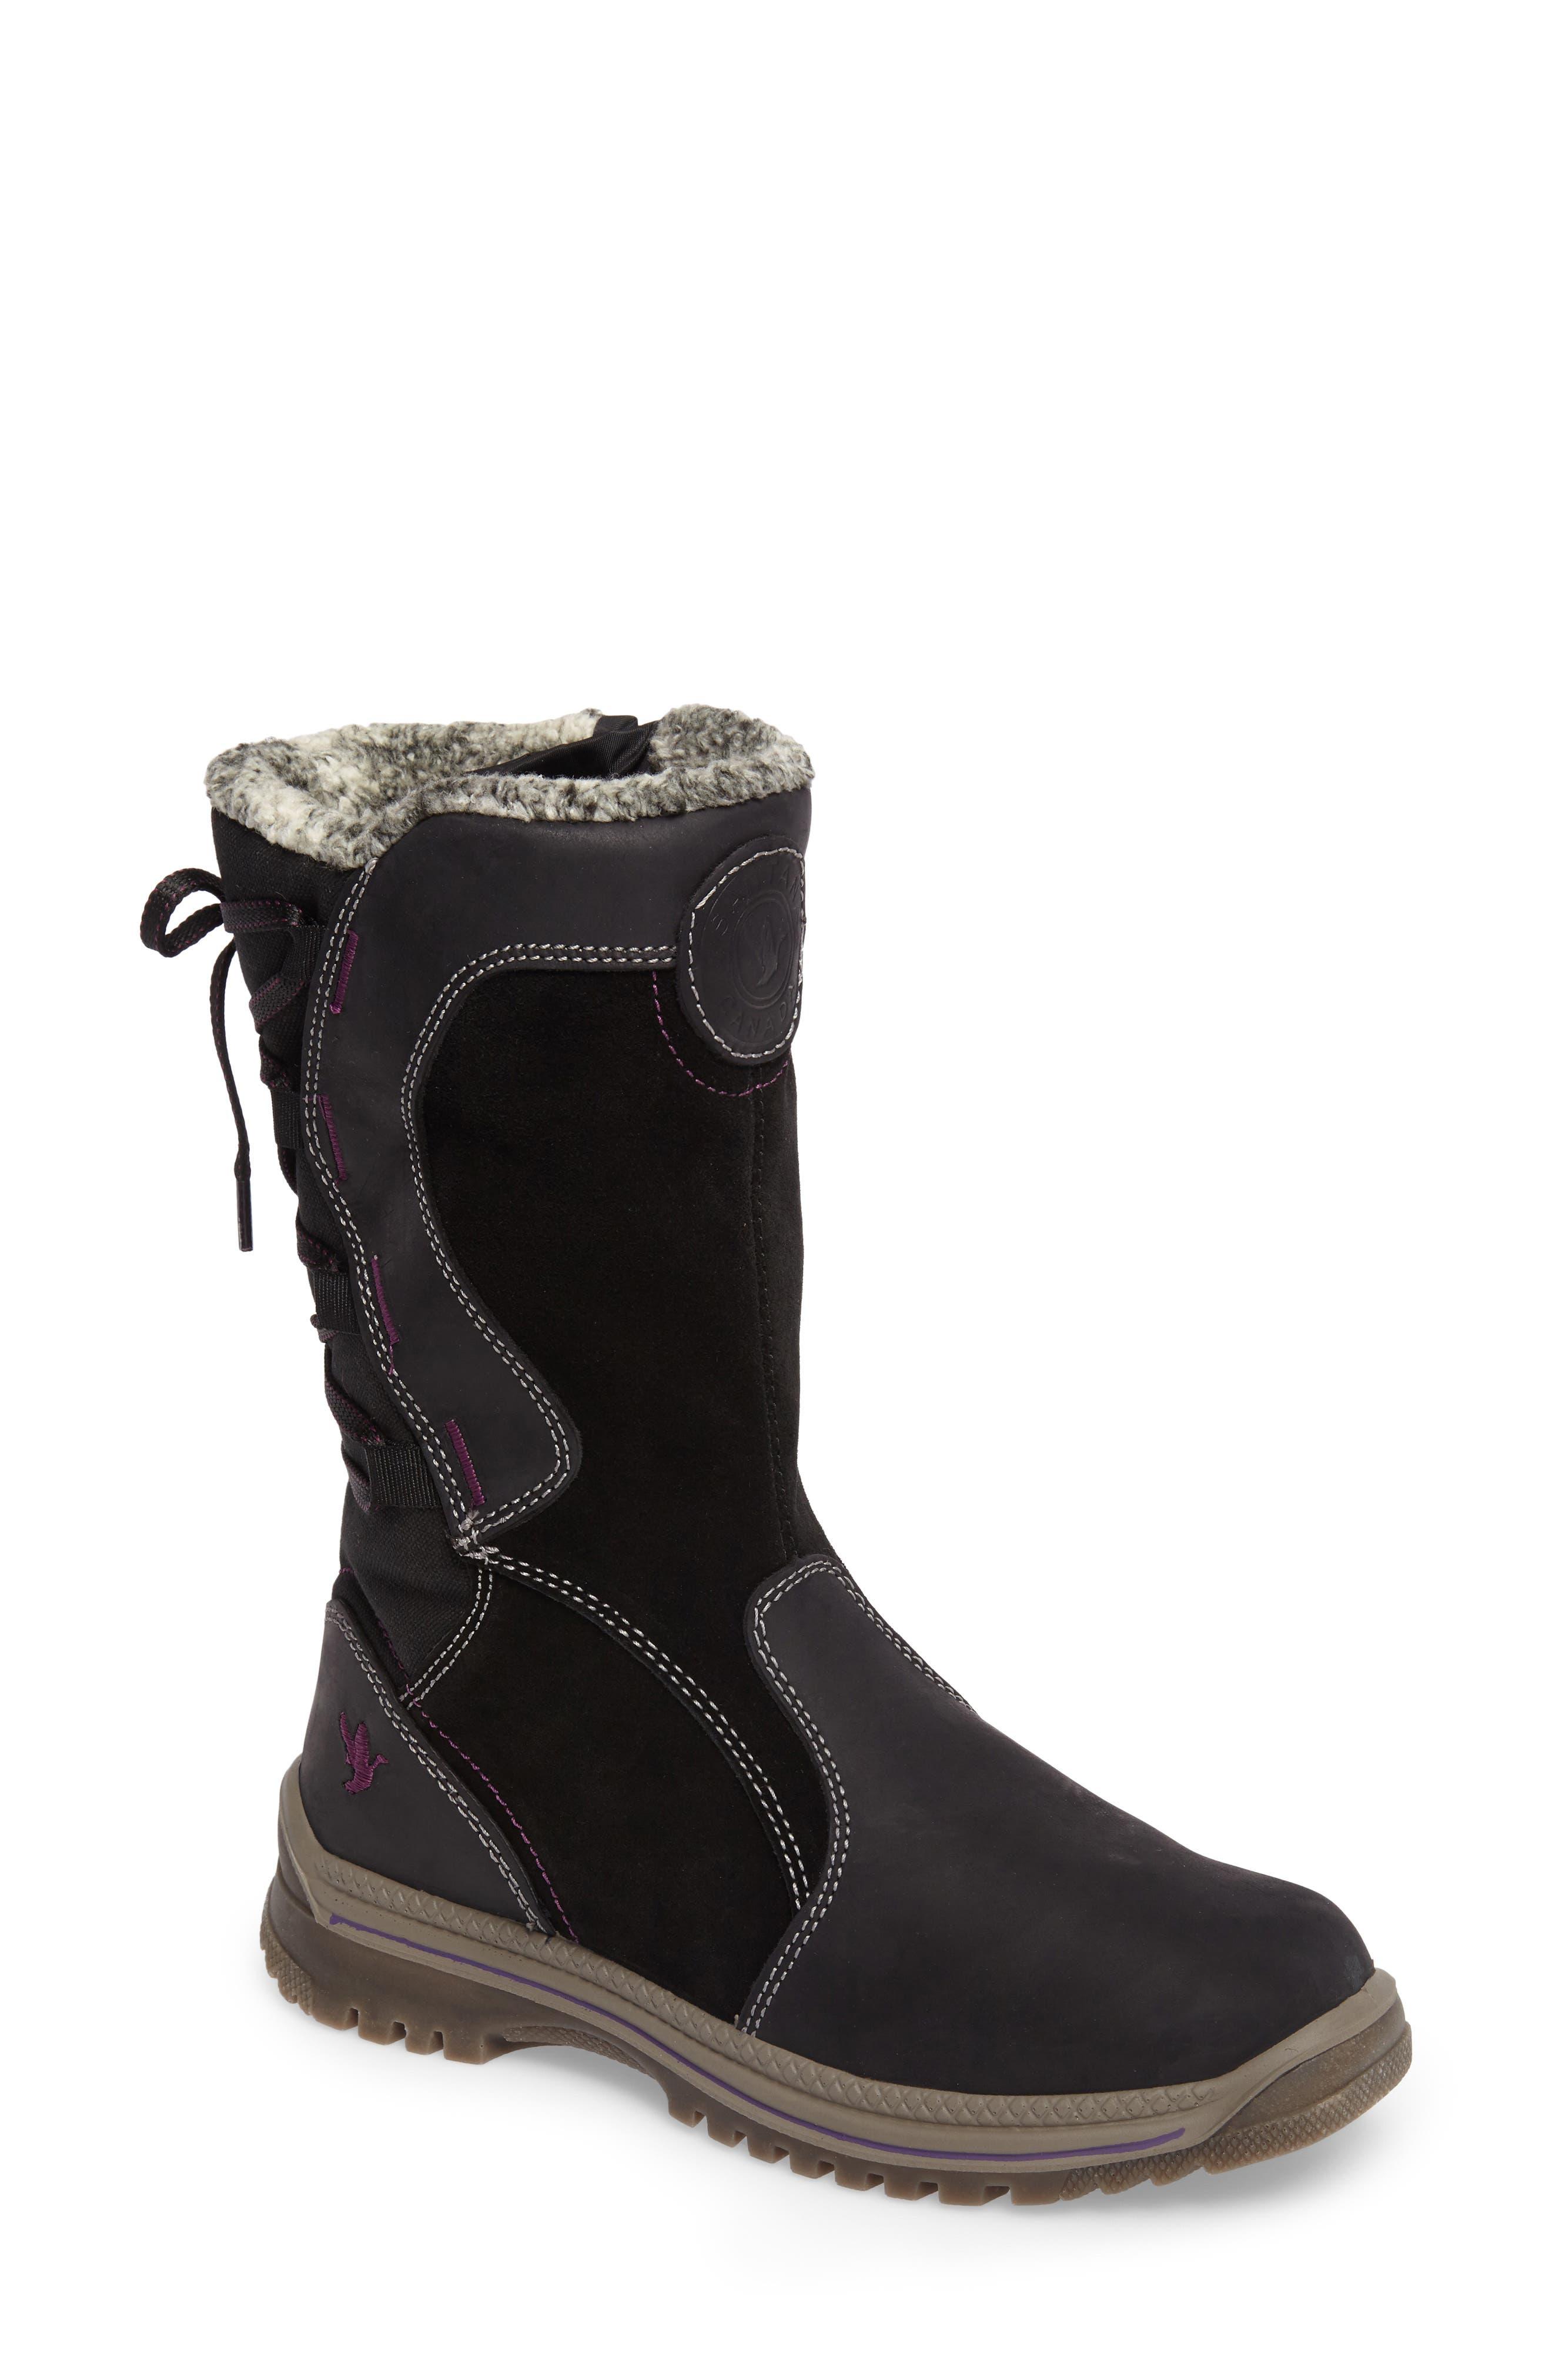 Santana Canada Mayer Faux Fur Lined Waterproof Boot (Women)